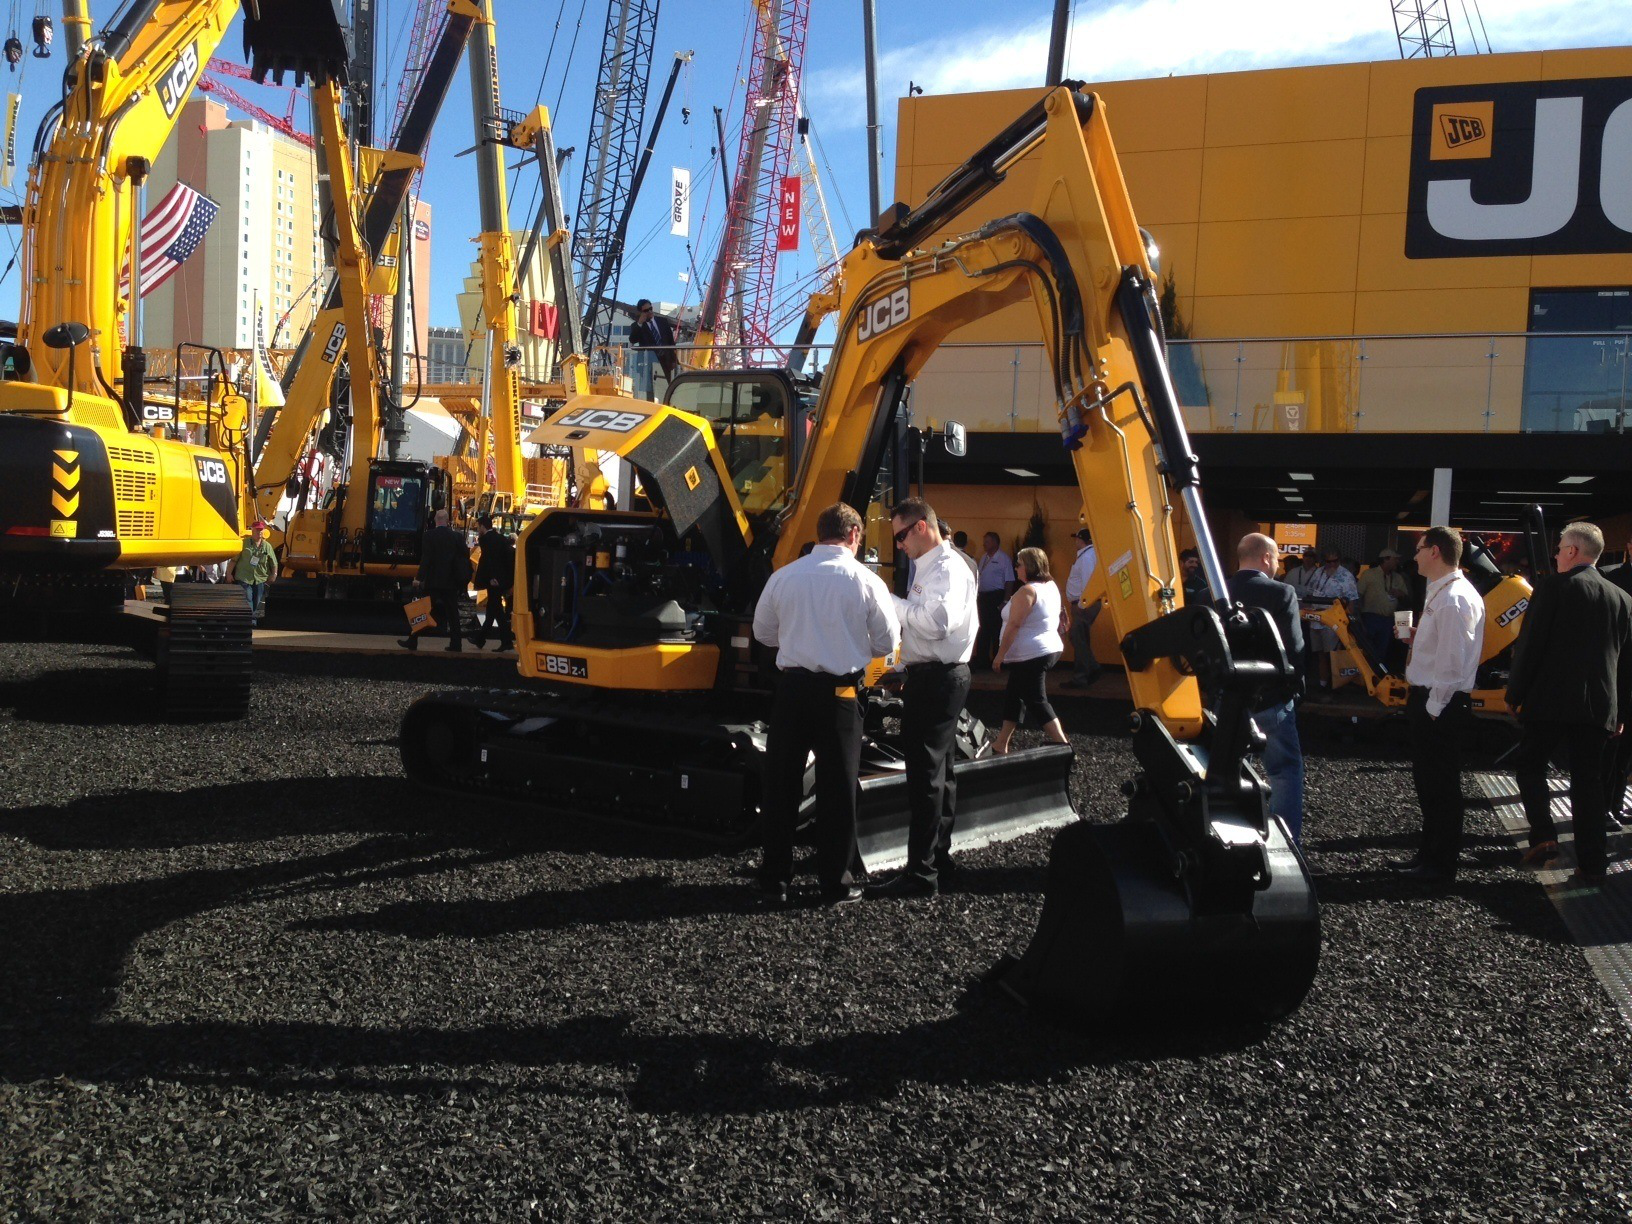 JCB's 85Z-1 midi excavator uses 10 percent less fuel than the previous model.